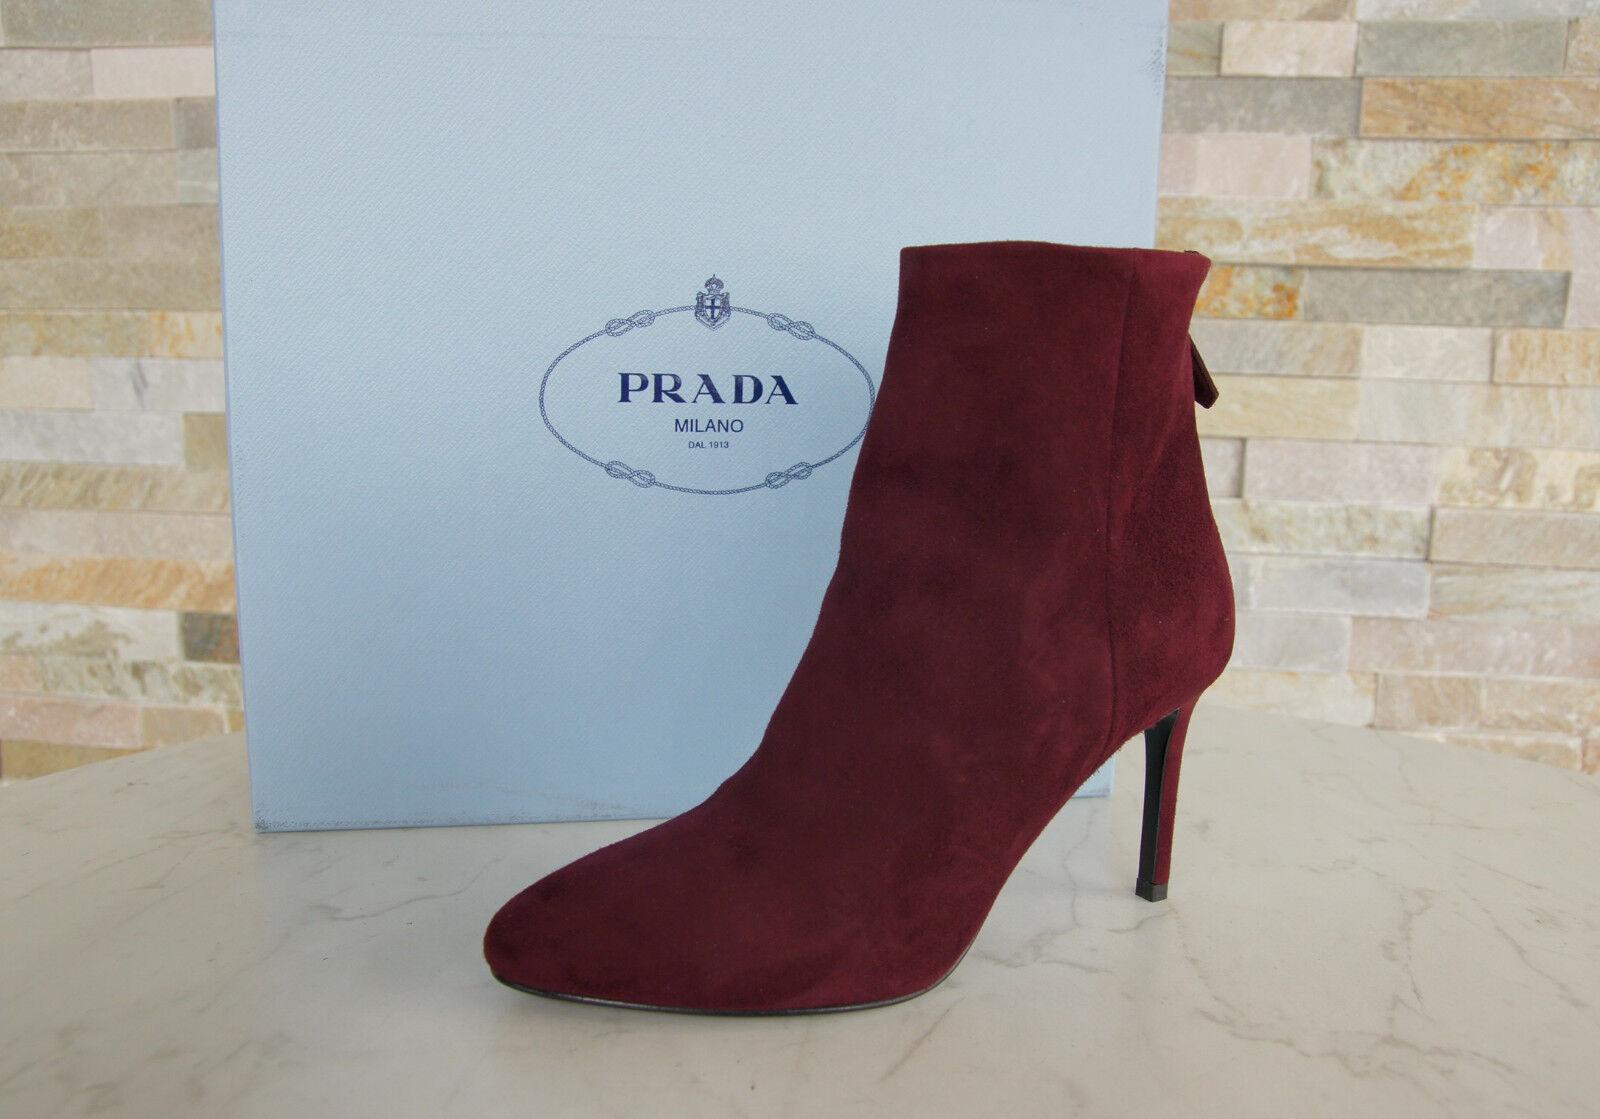 PRADA Gr 36 Stiefeletten Stiefel Schuhe Granato rot 1T079G neu ehem.